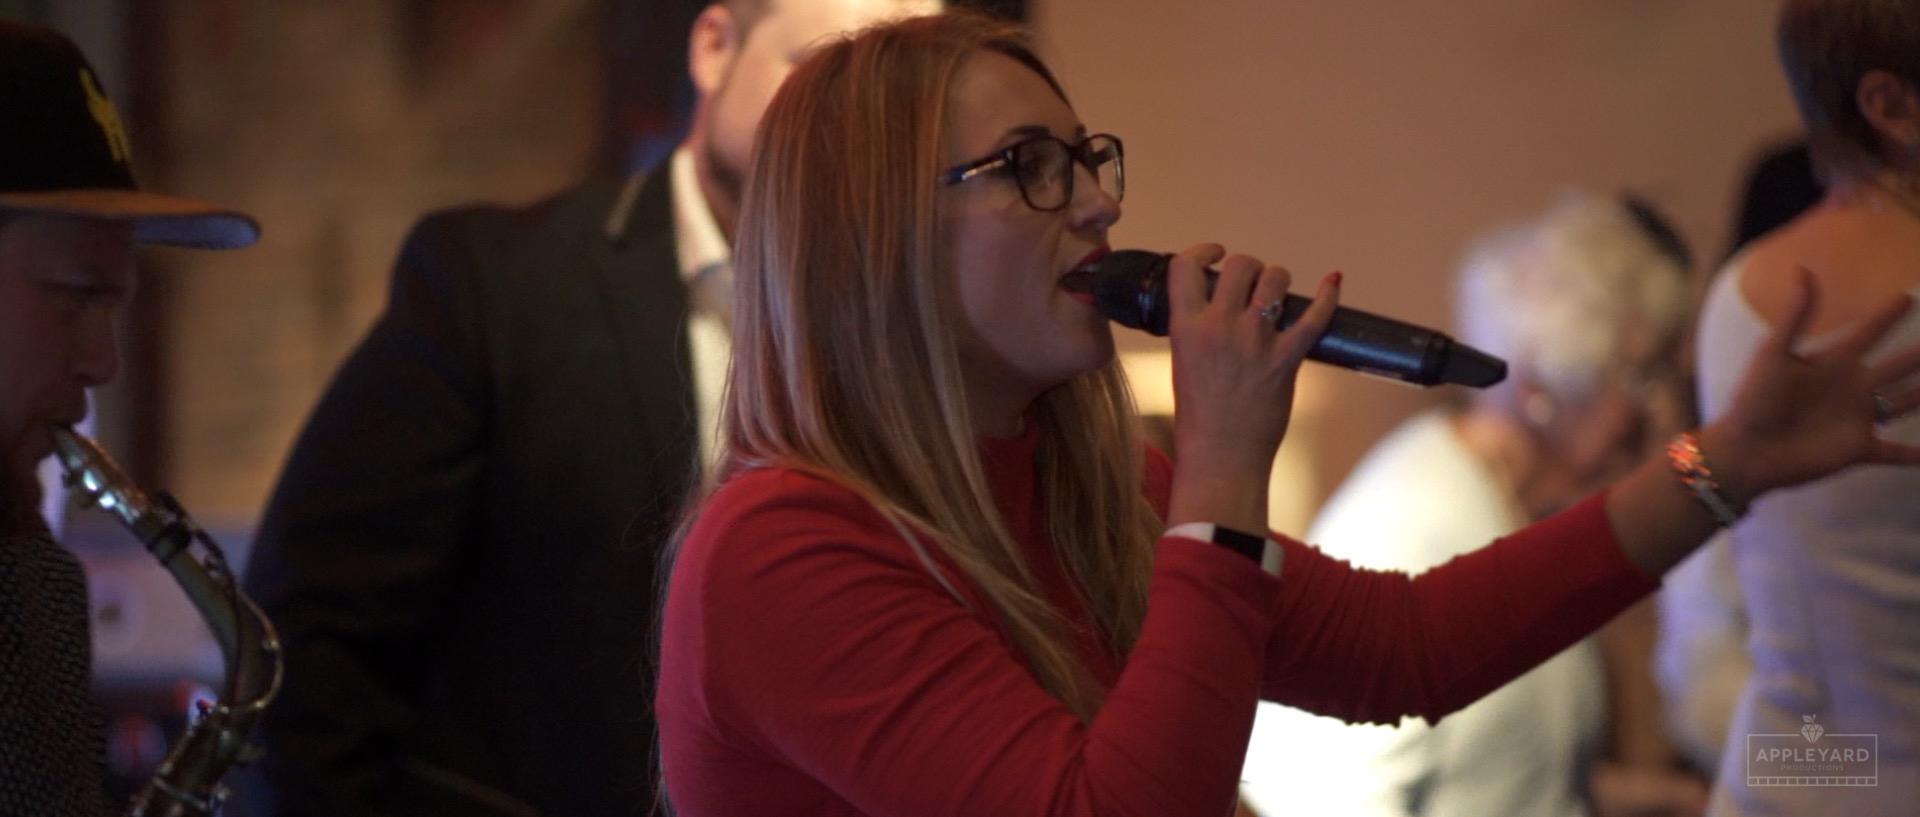 JENNIE SAWDON SINGER 4.jpg